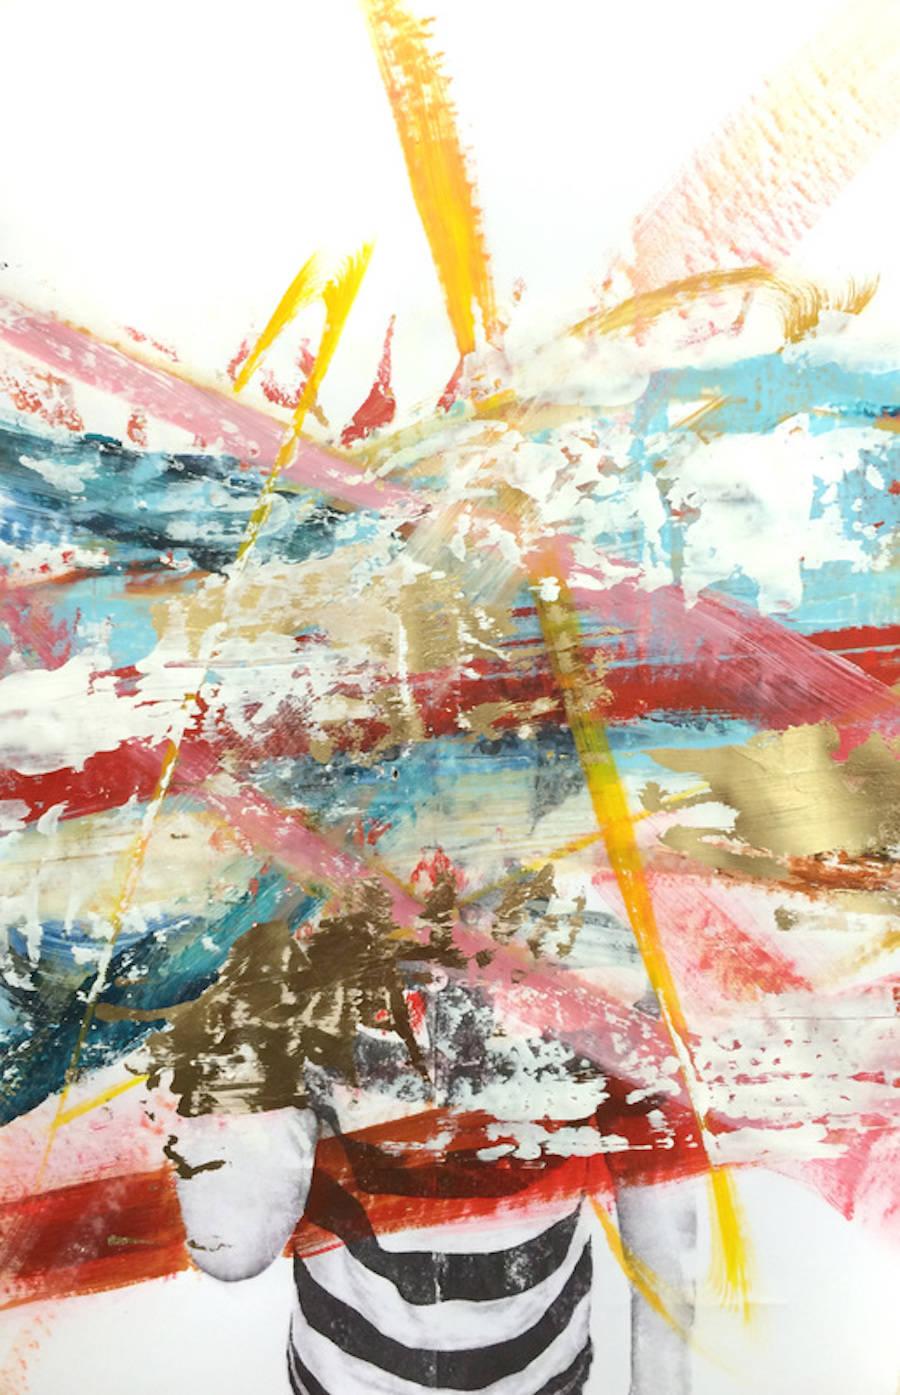 Superventions Painting Portrait Project